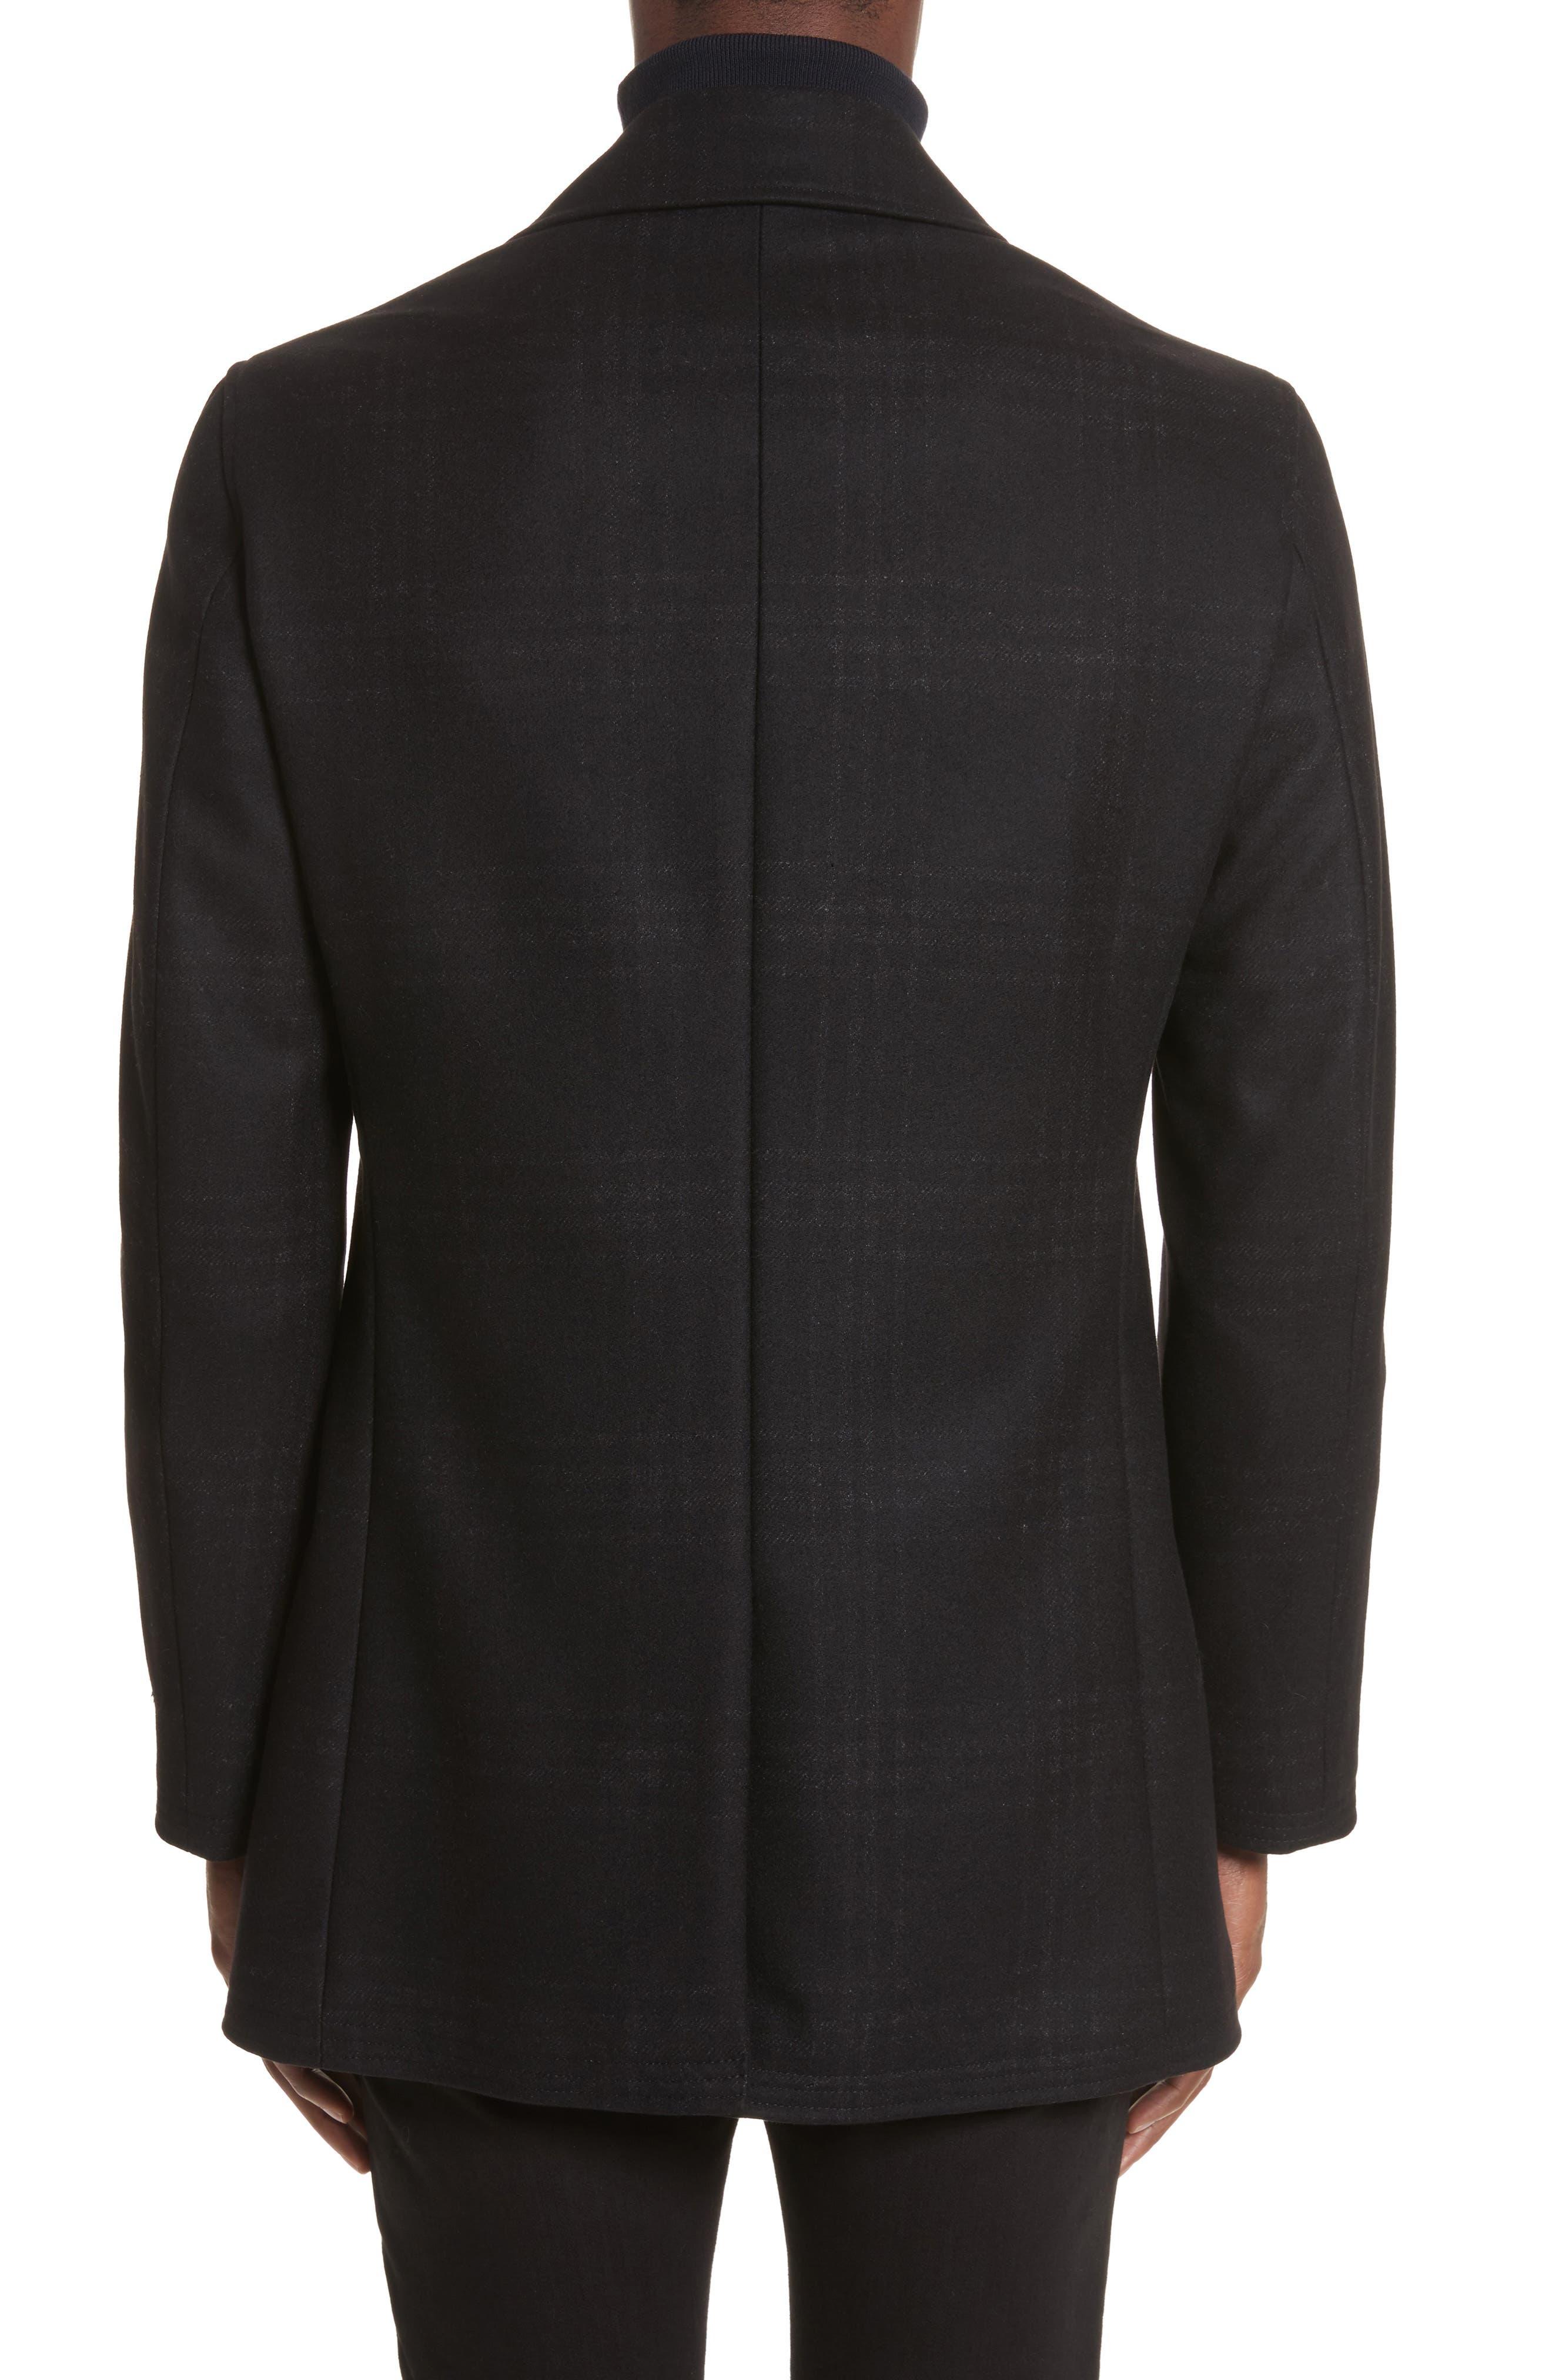 Hook Plaid Wool Blend Topcoat,                             Alternate thumbnail 2, color,                             001